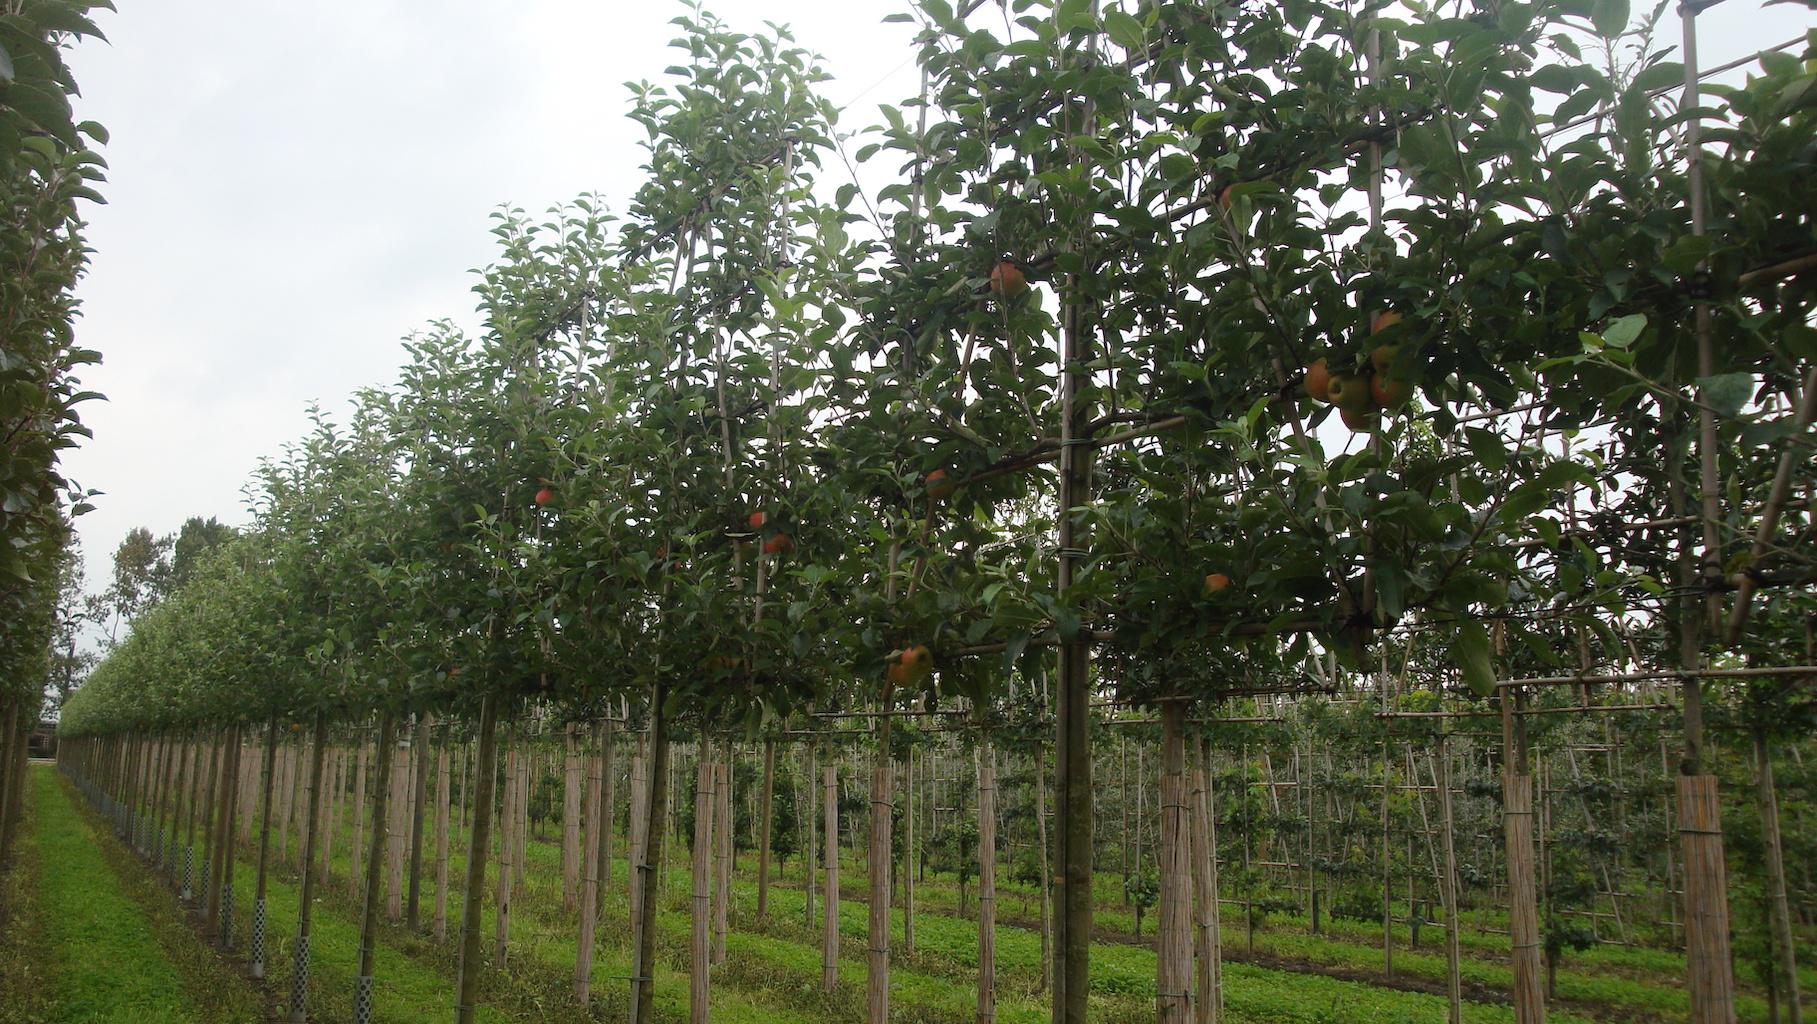 Malus domestica 'Elstar' espalier apple trees 18-20 grade